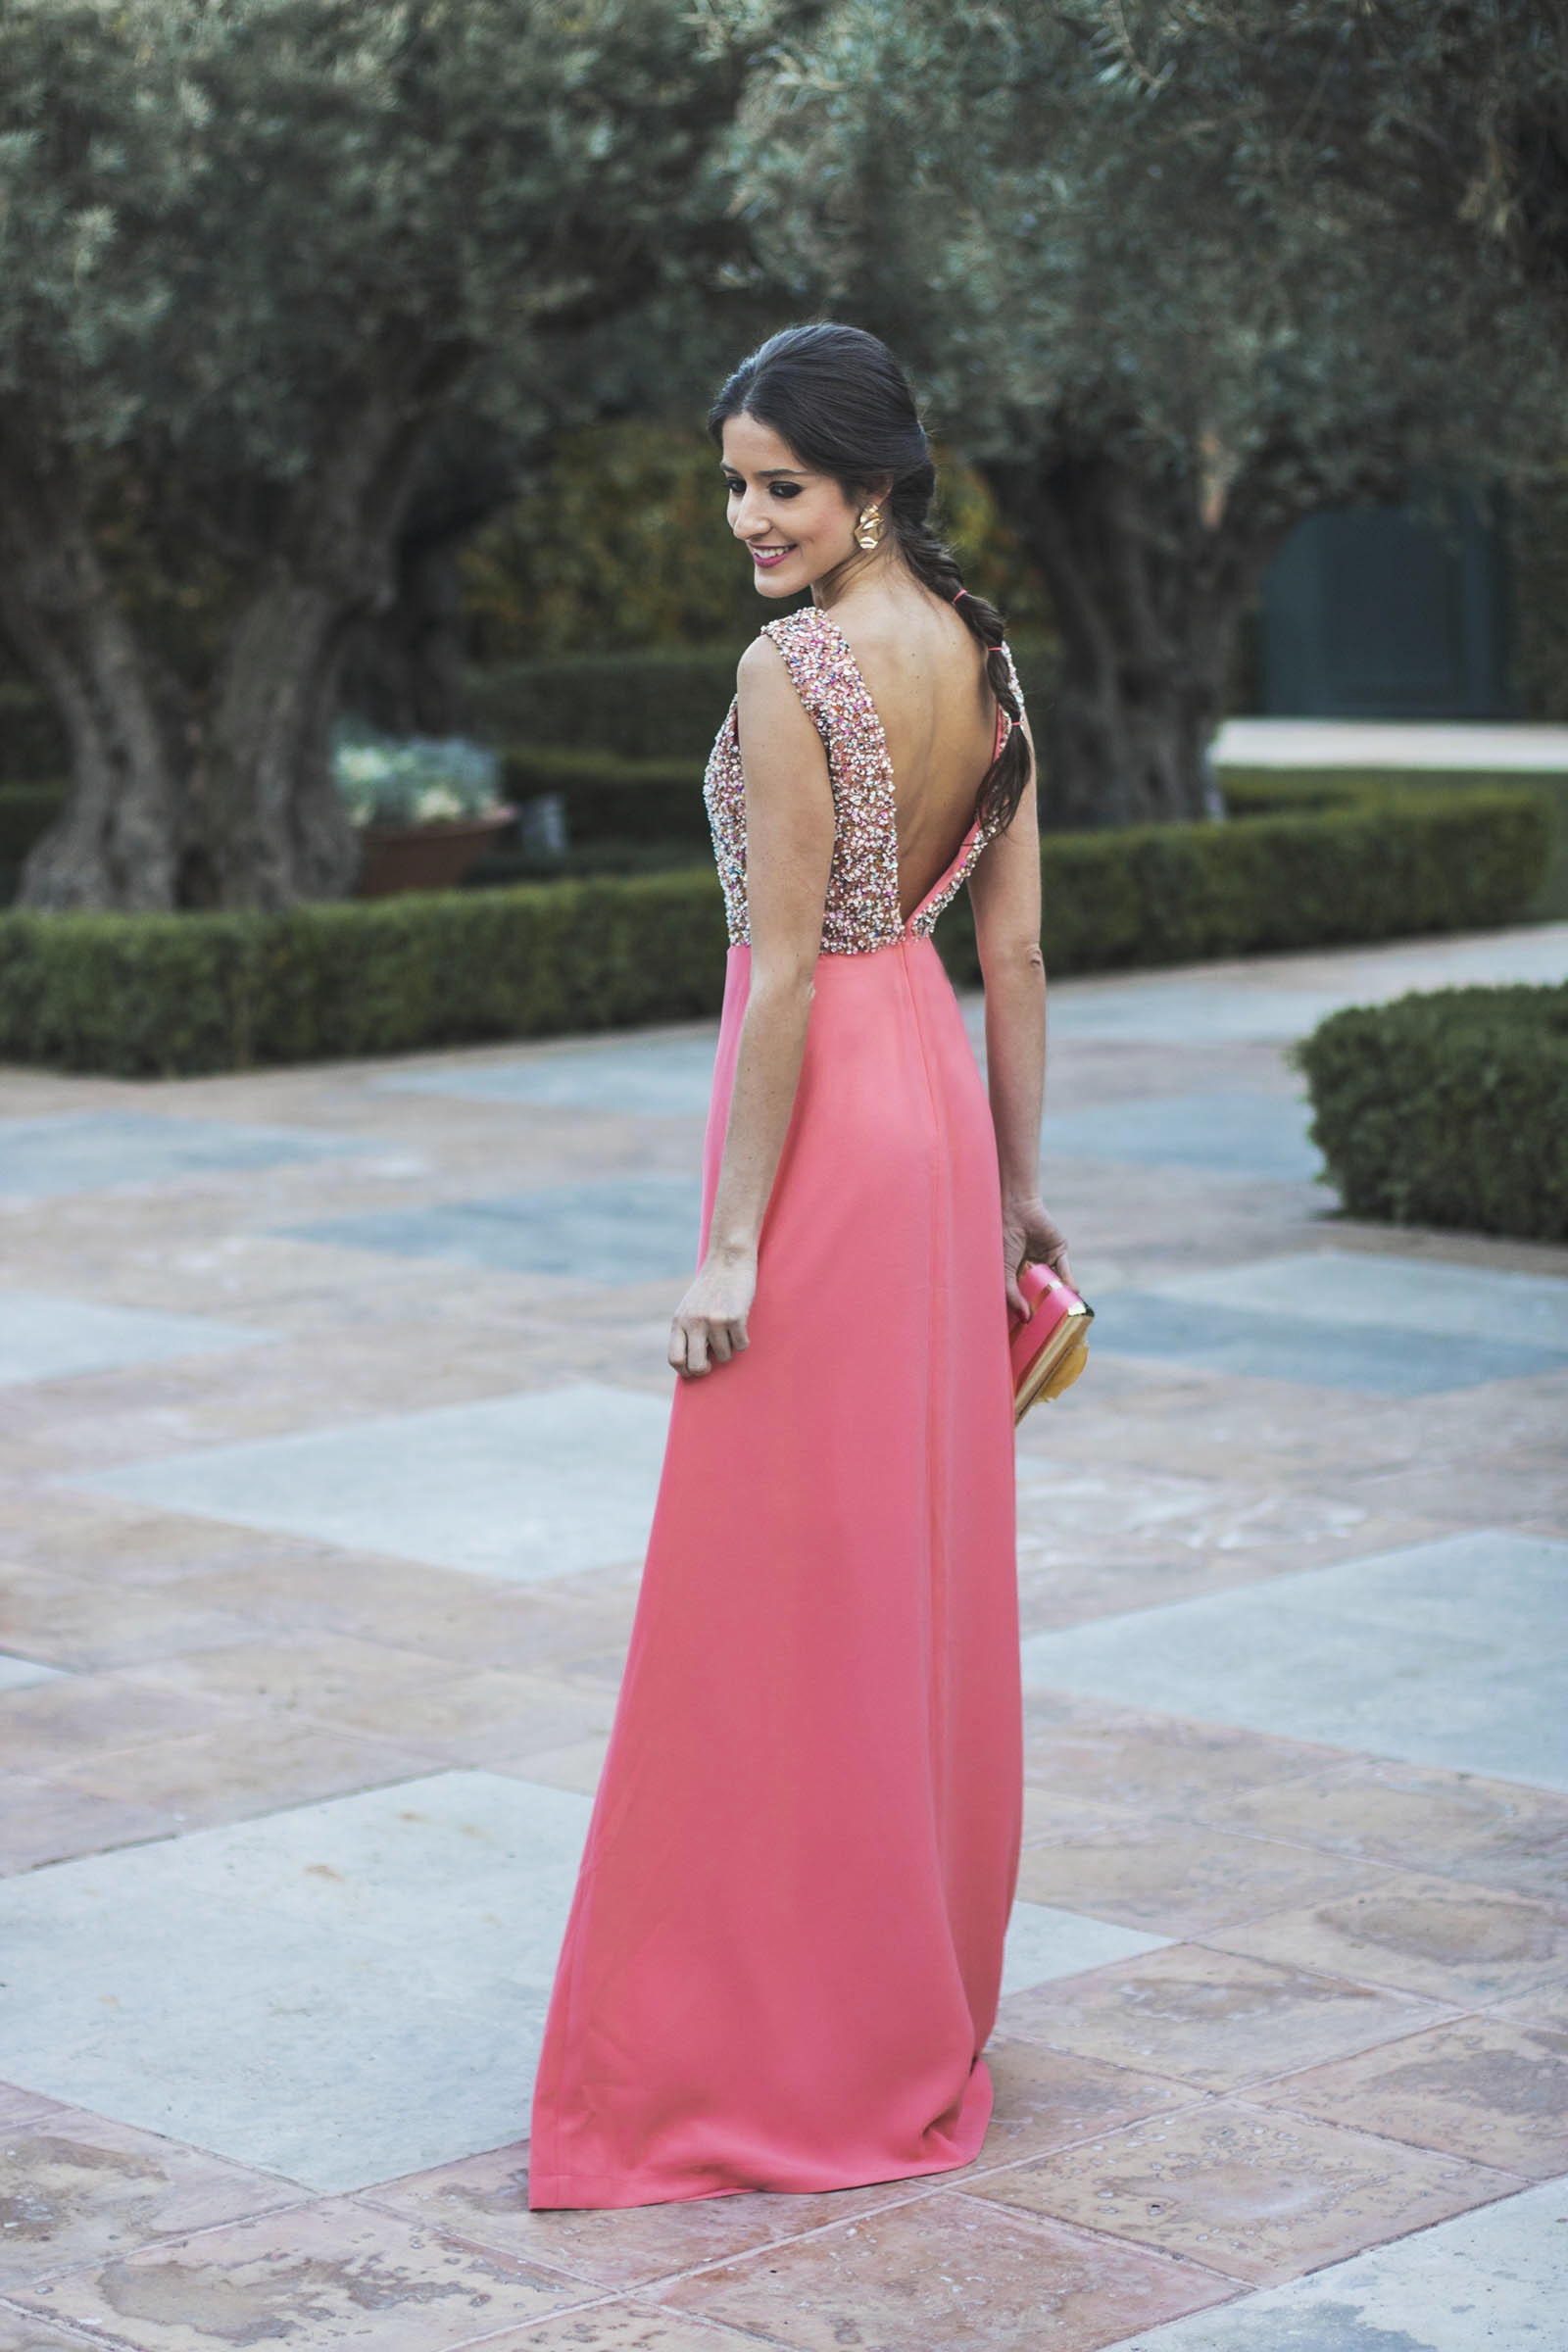 Vestido largo boda invitada – Vestidos de moda de esta temporada